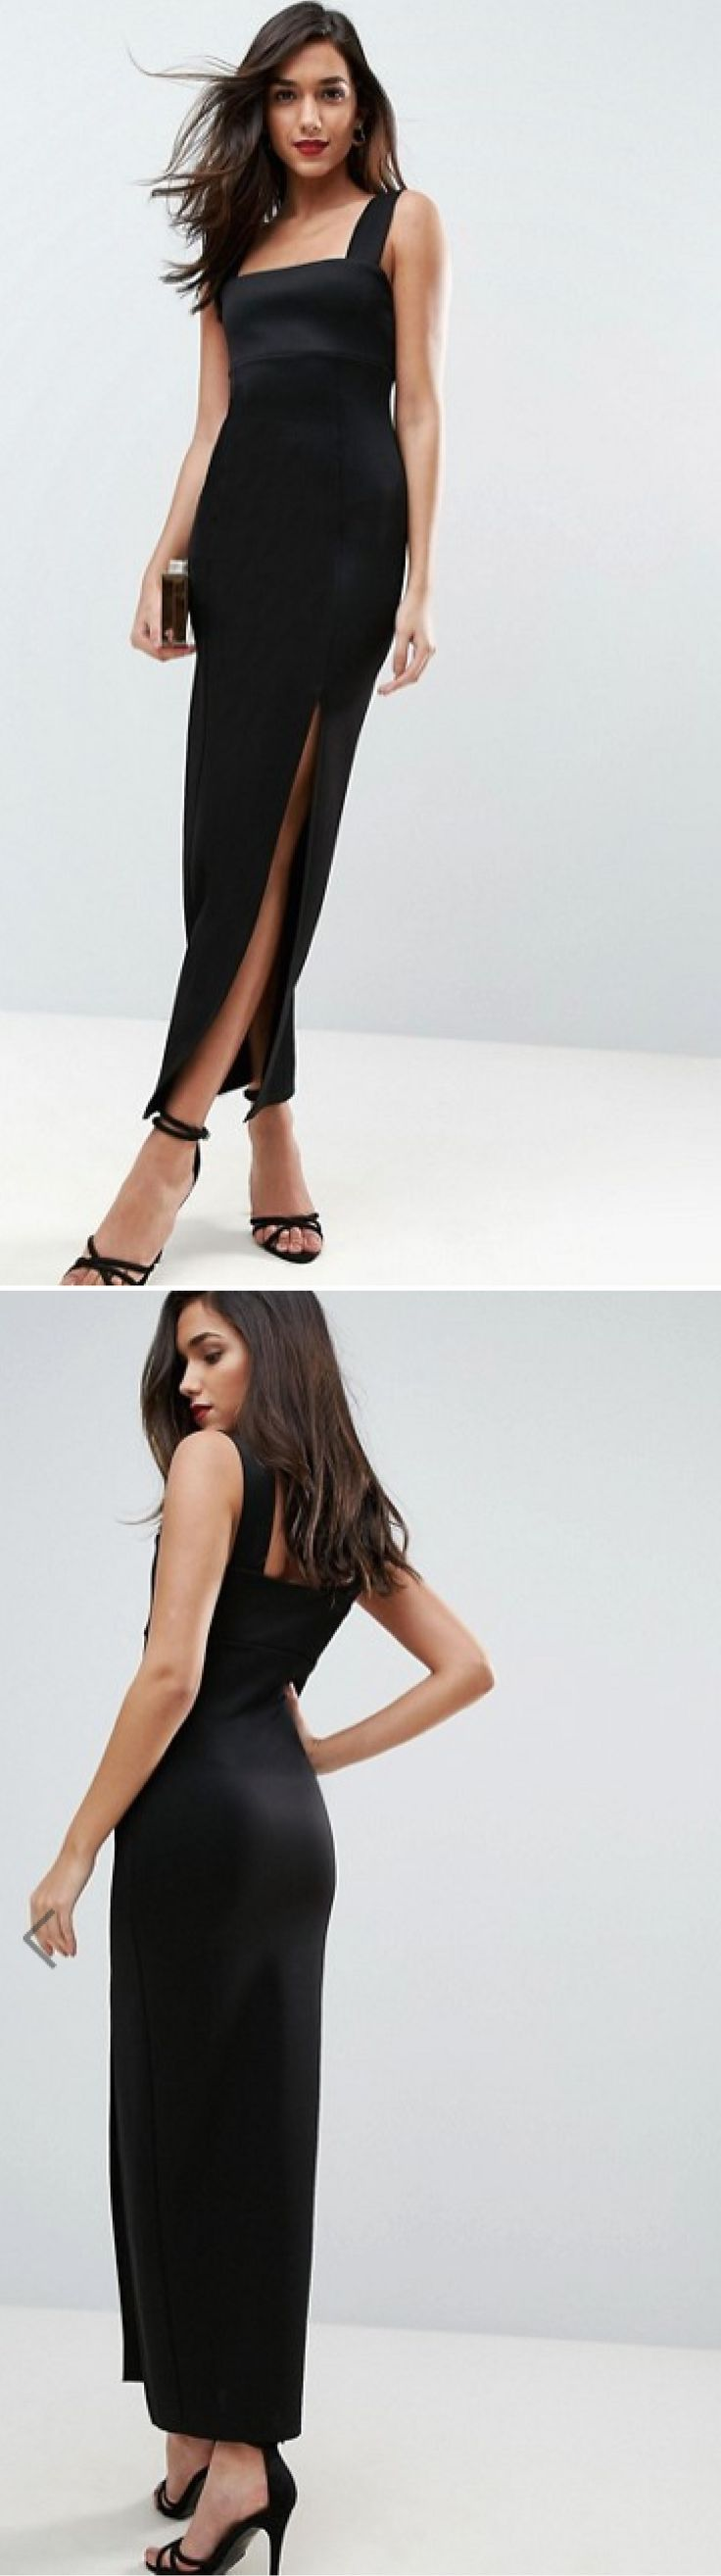 Simple little black dress blackdress dress longdress